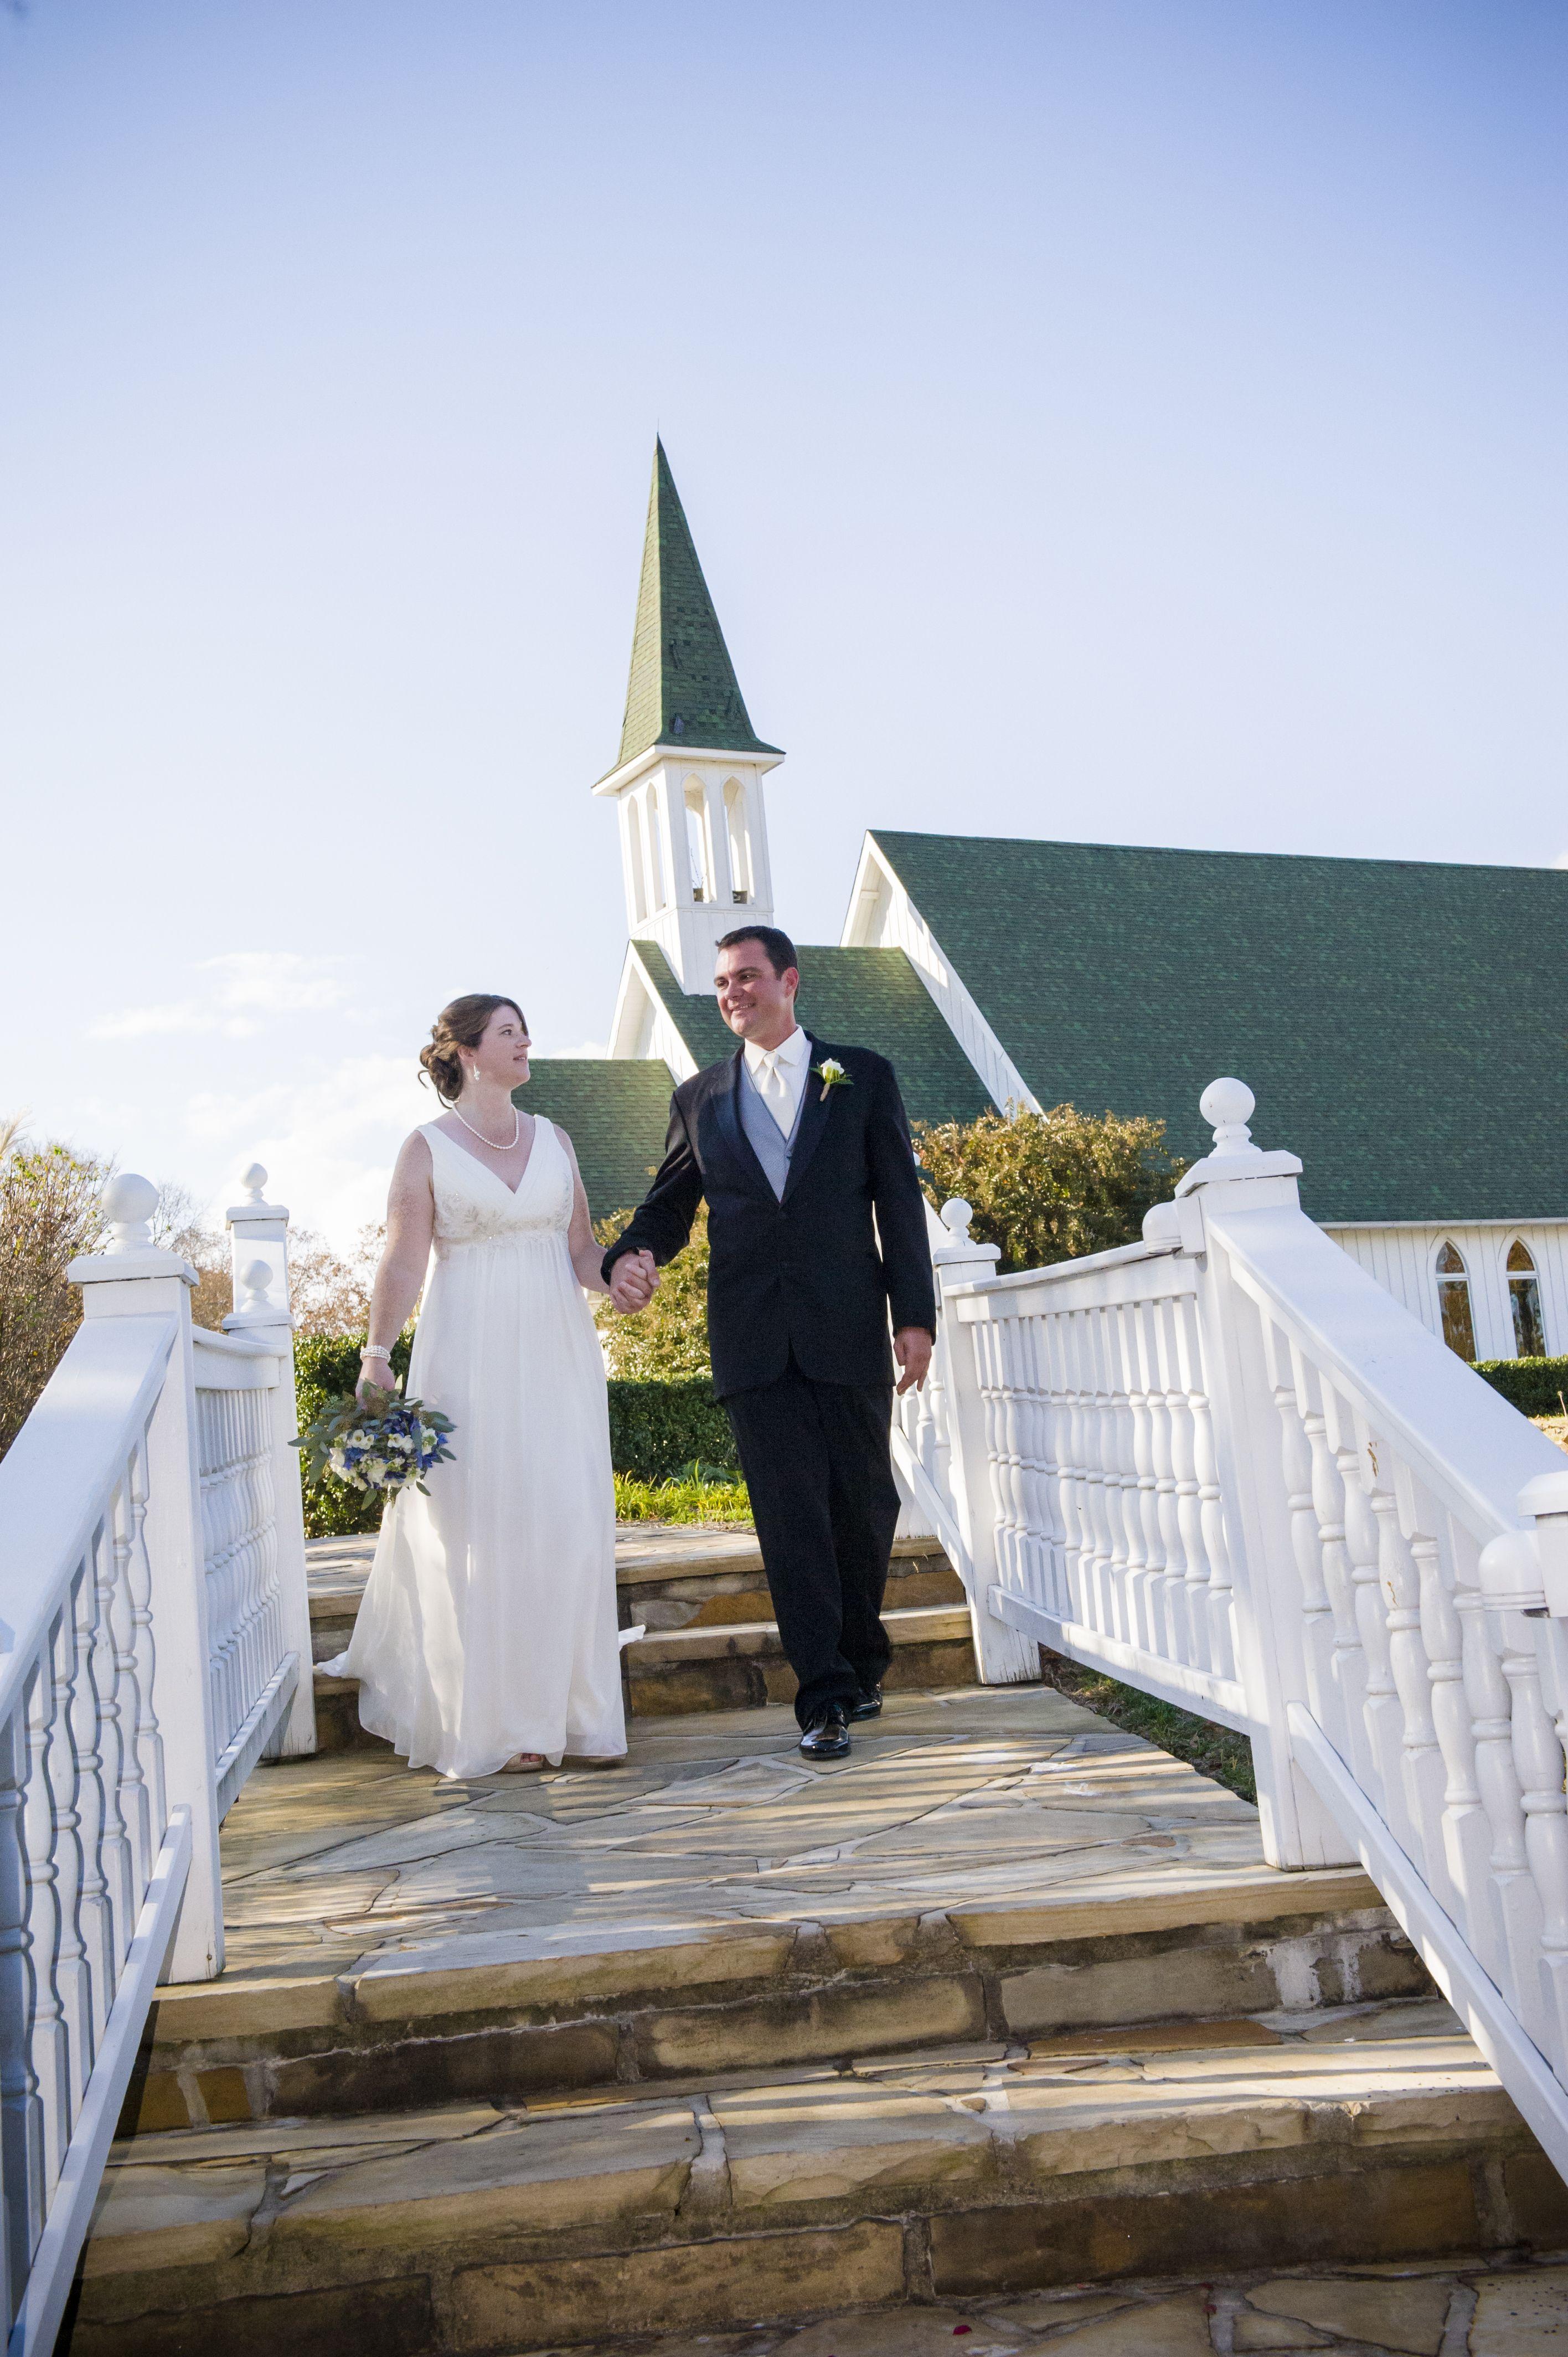 Whitestone Country Inn - Kingston, Tennessee   Photo list